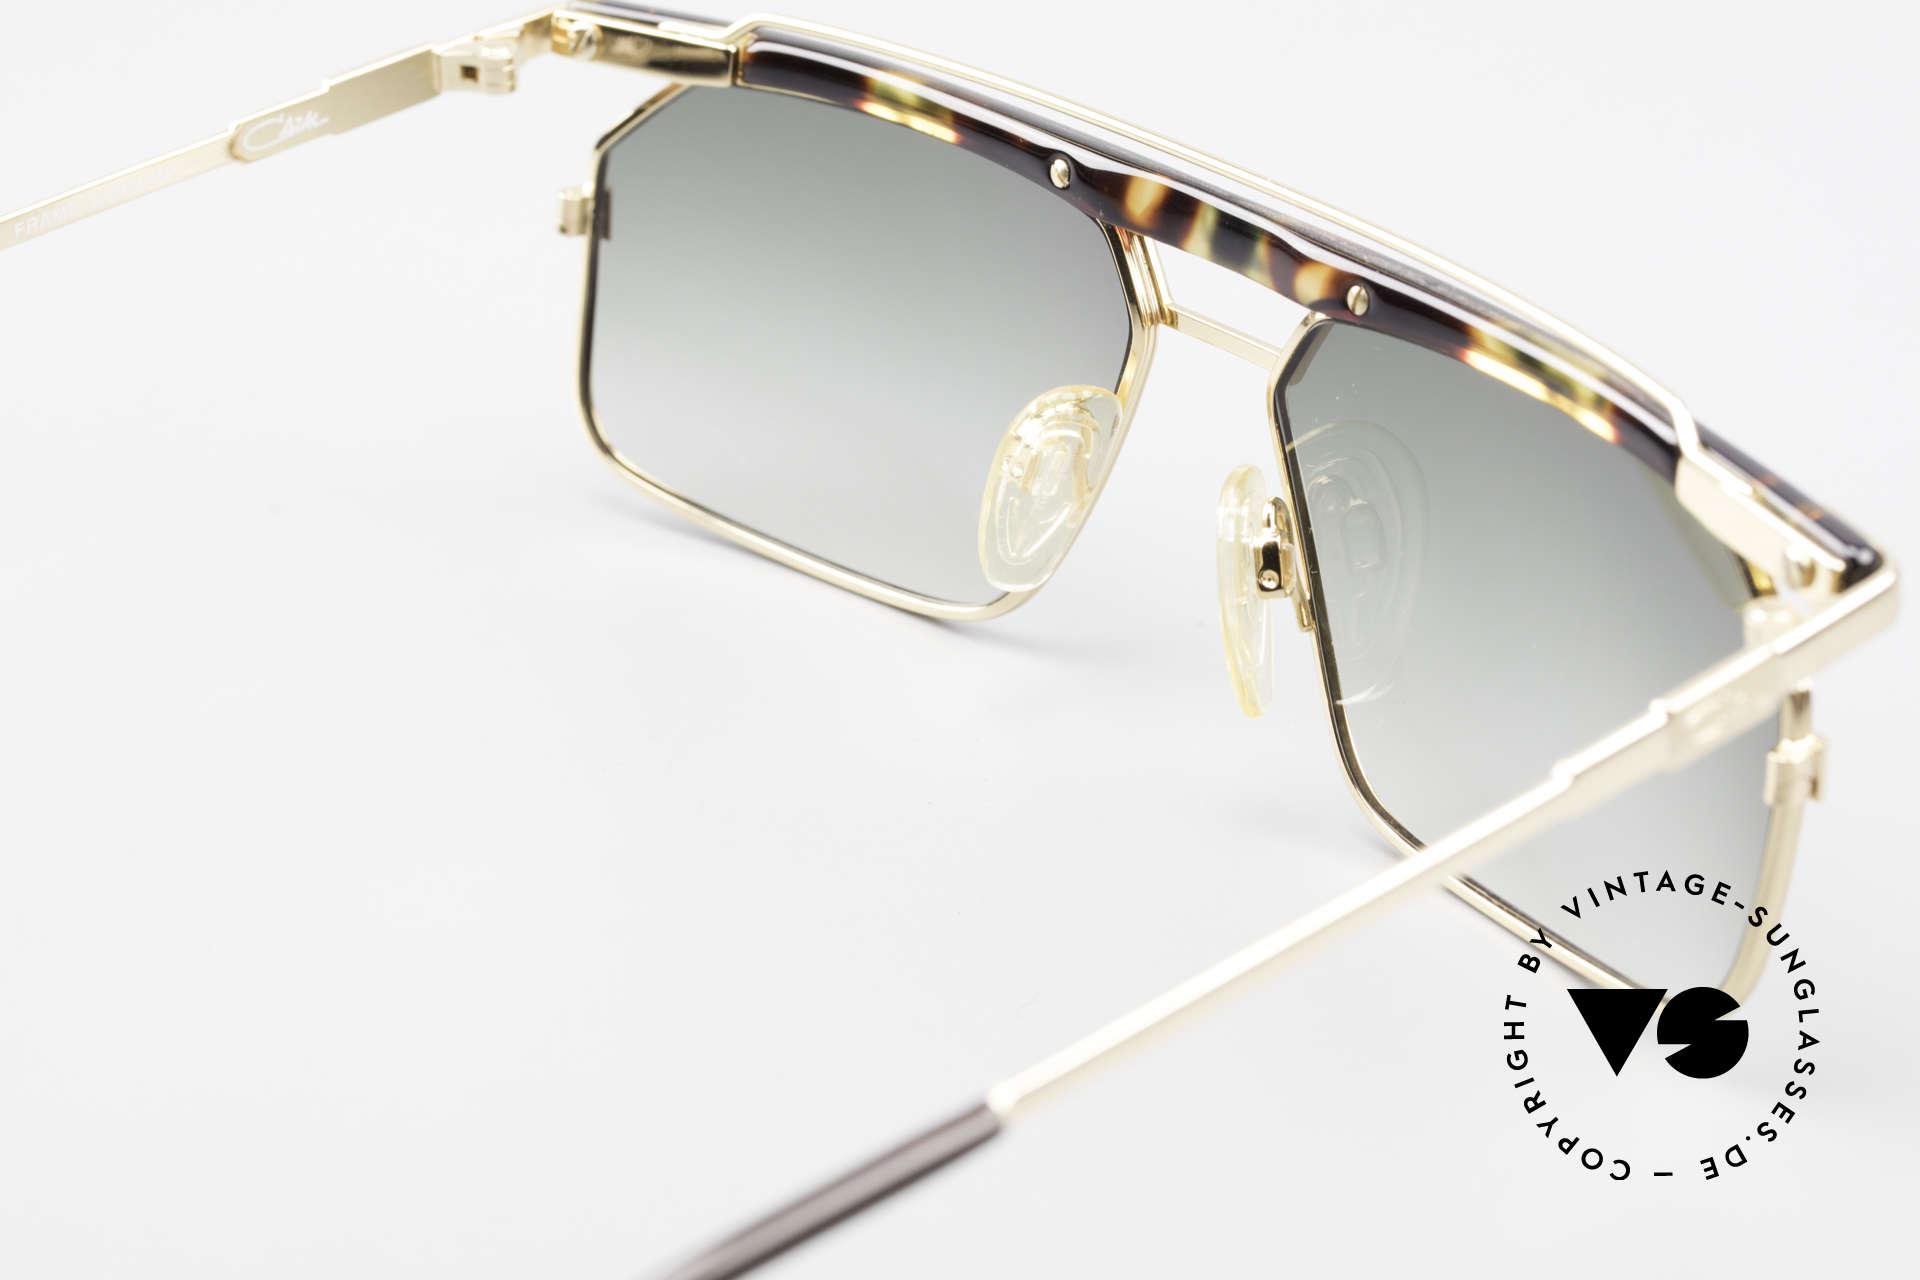 Cazal 752 Extraordinary Sunglasses 90's, never used (like all our vintage CAZAL eyewear), Made for Men